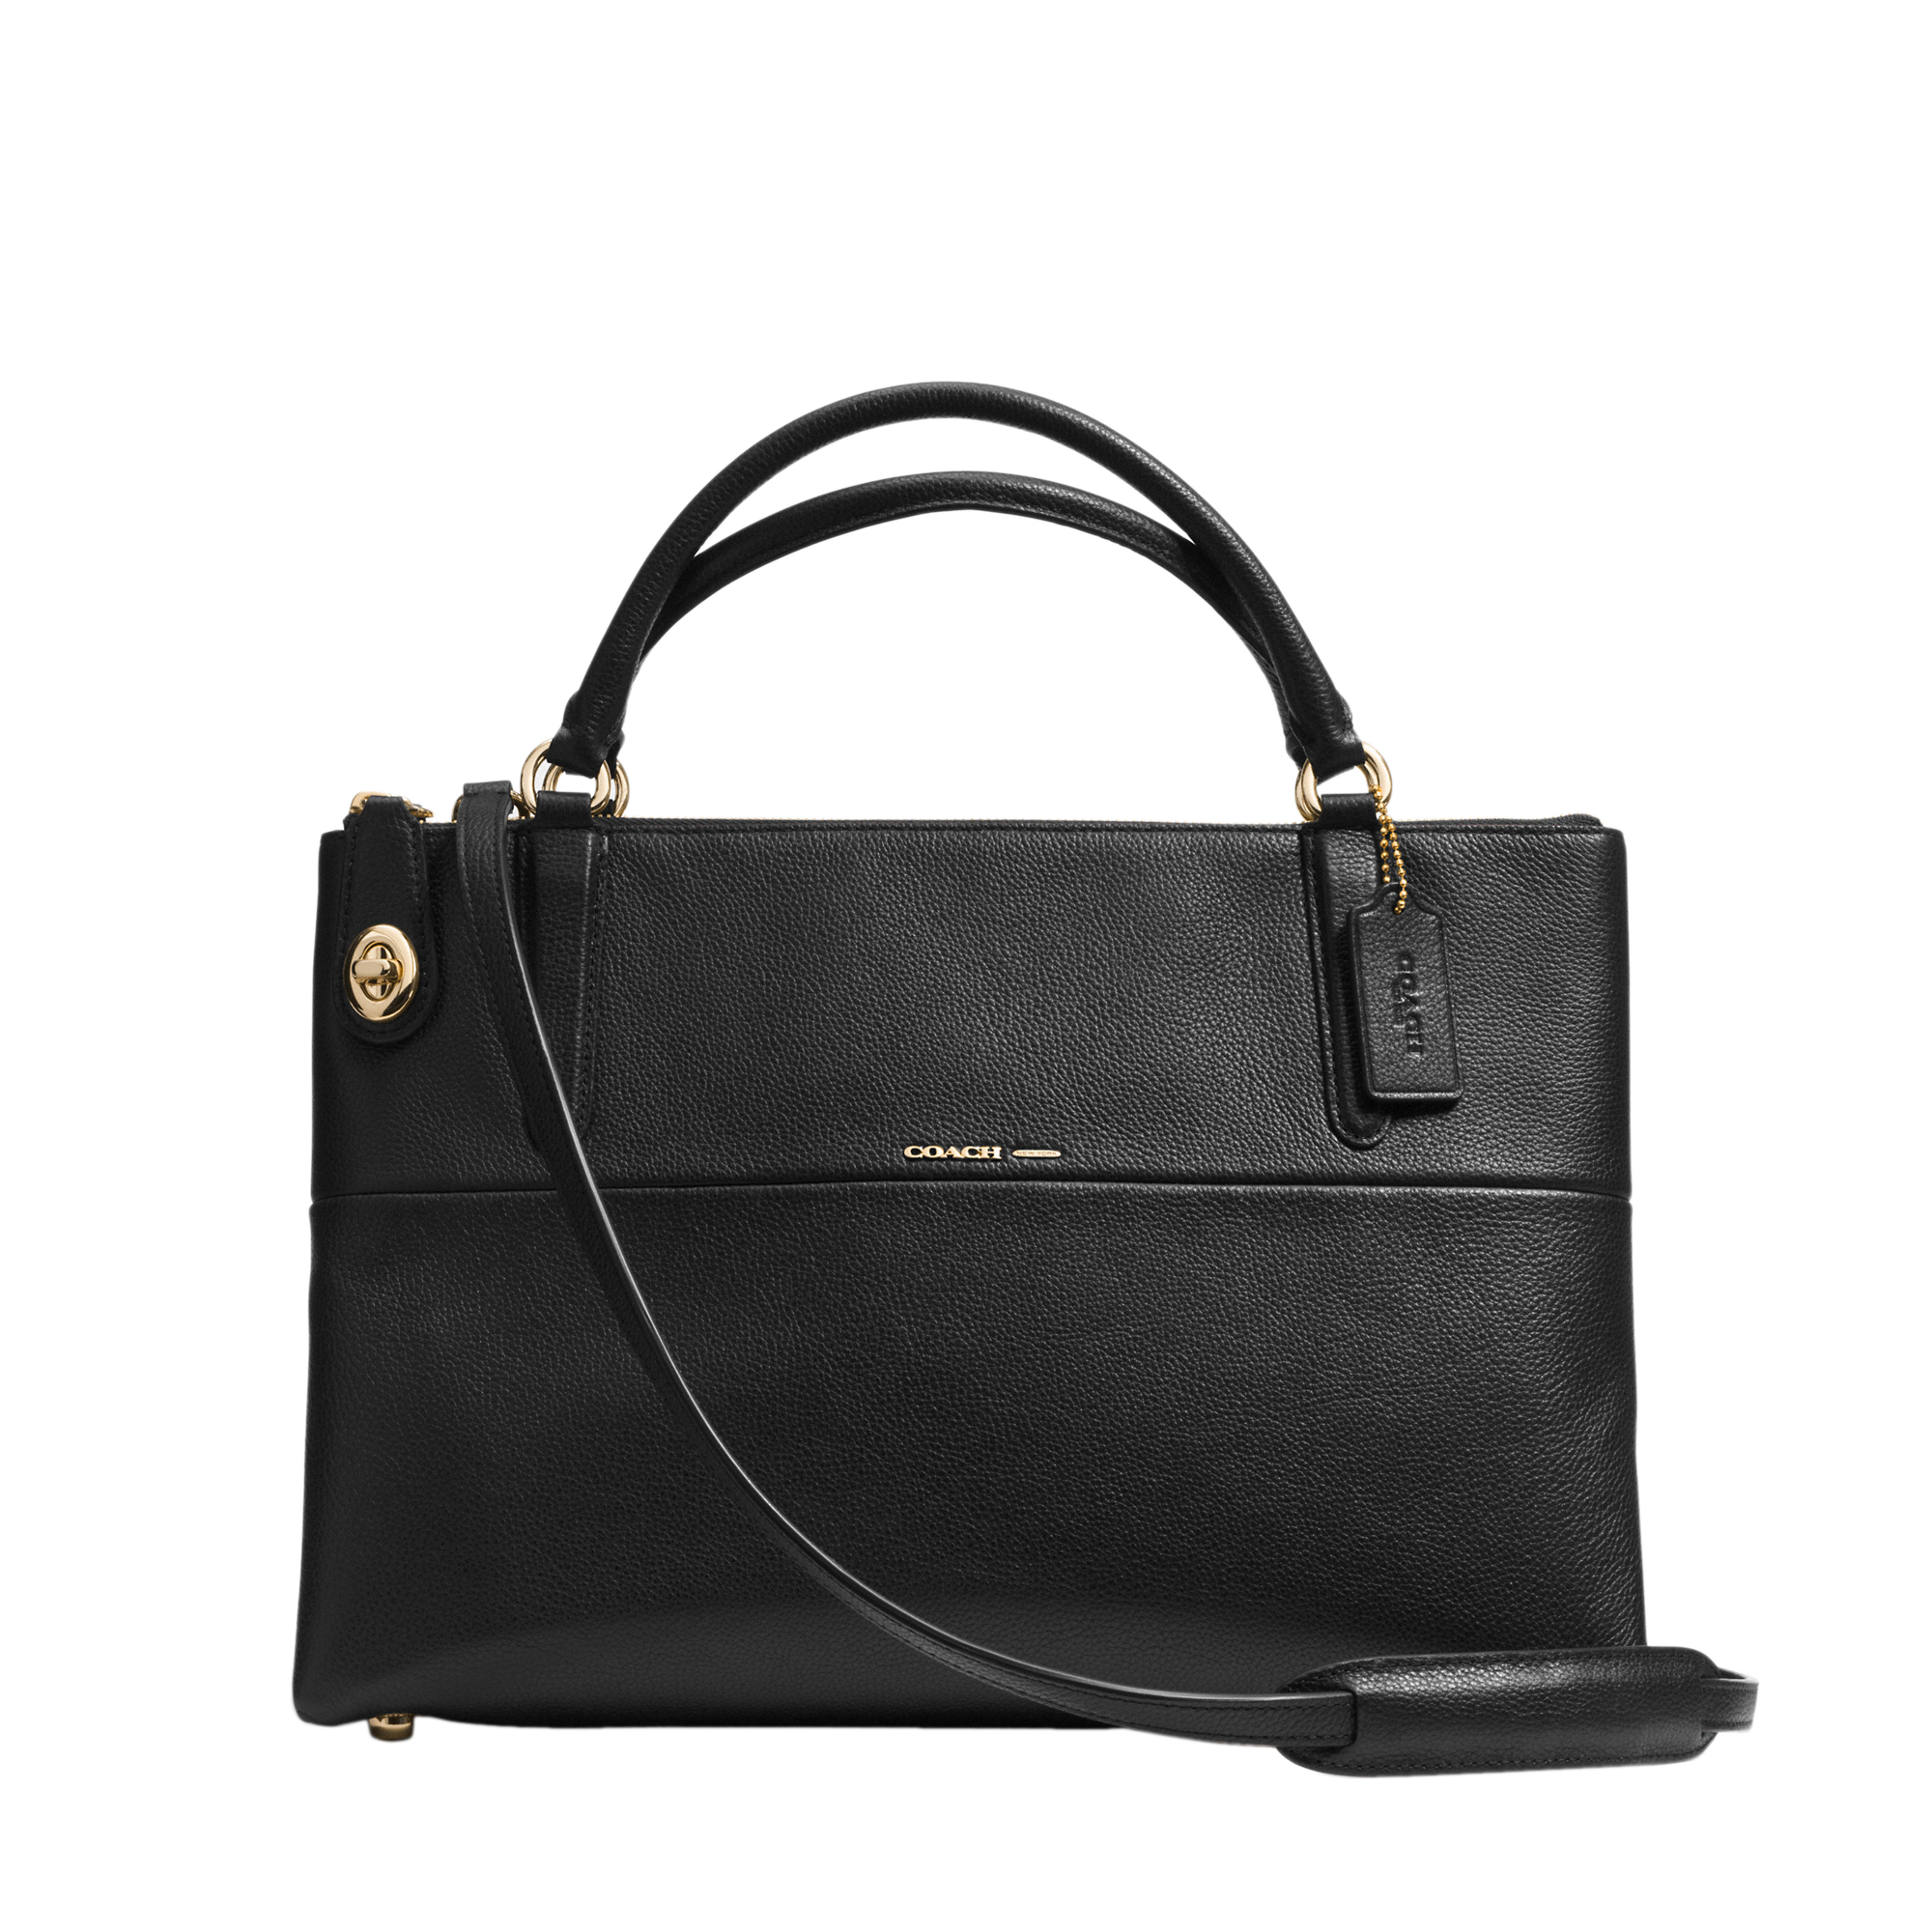 Coach Borough Bag in Black | Lyst